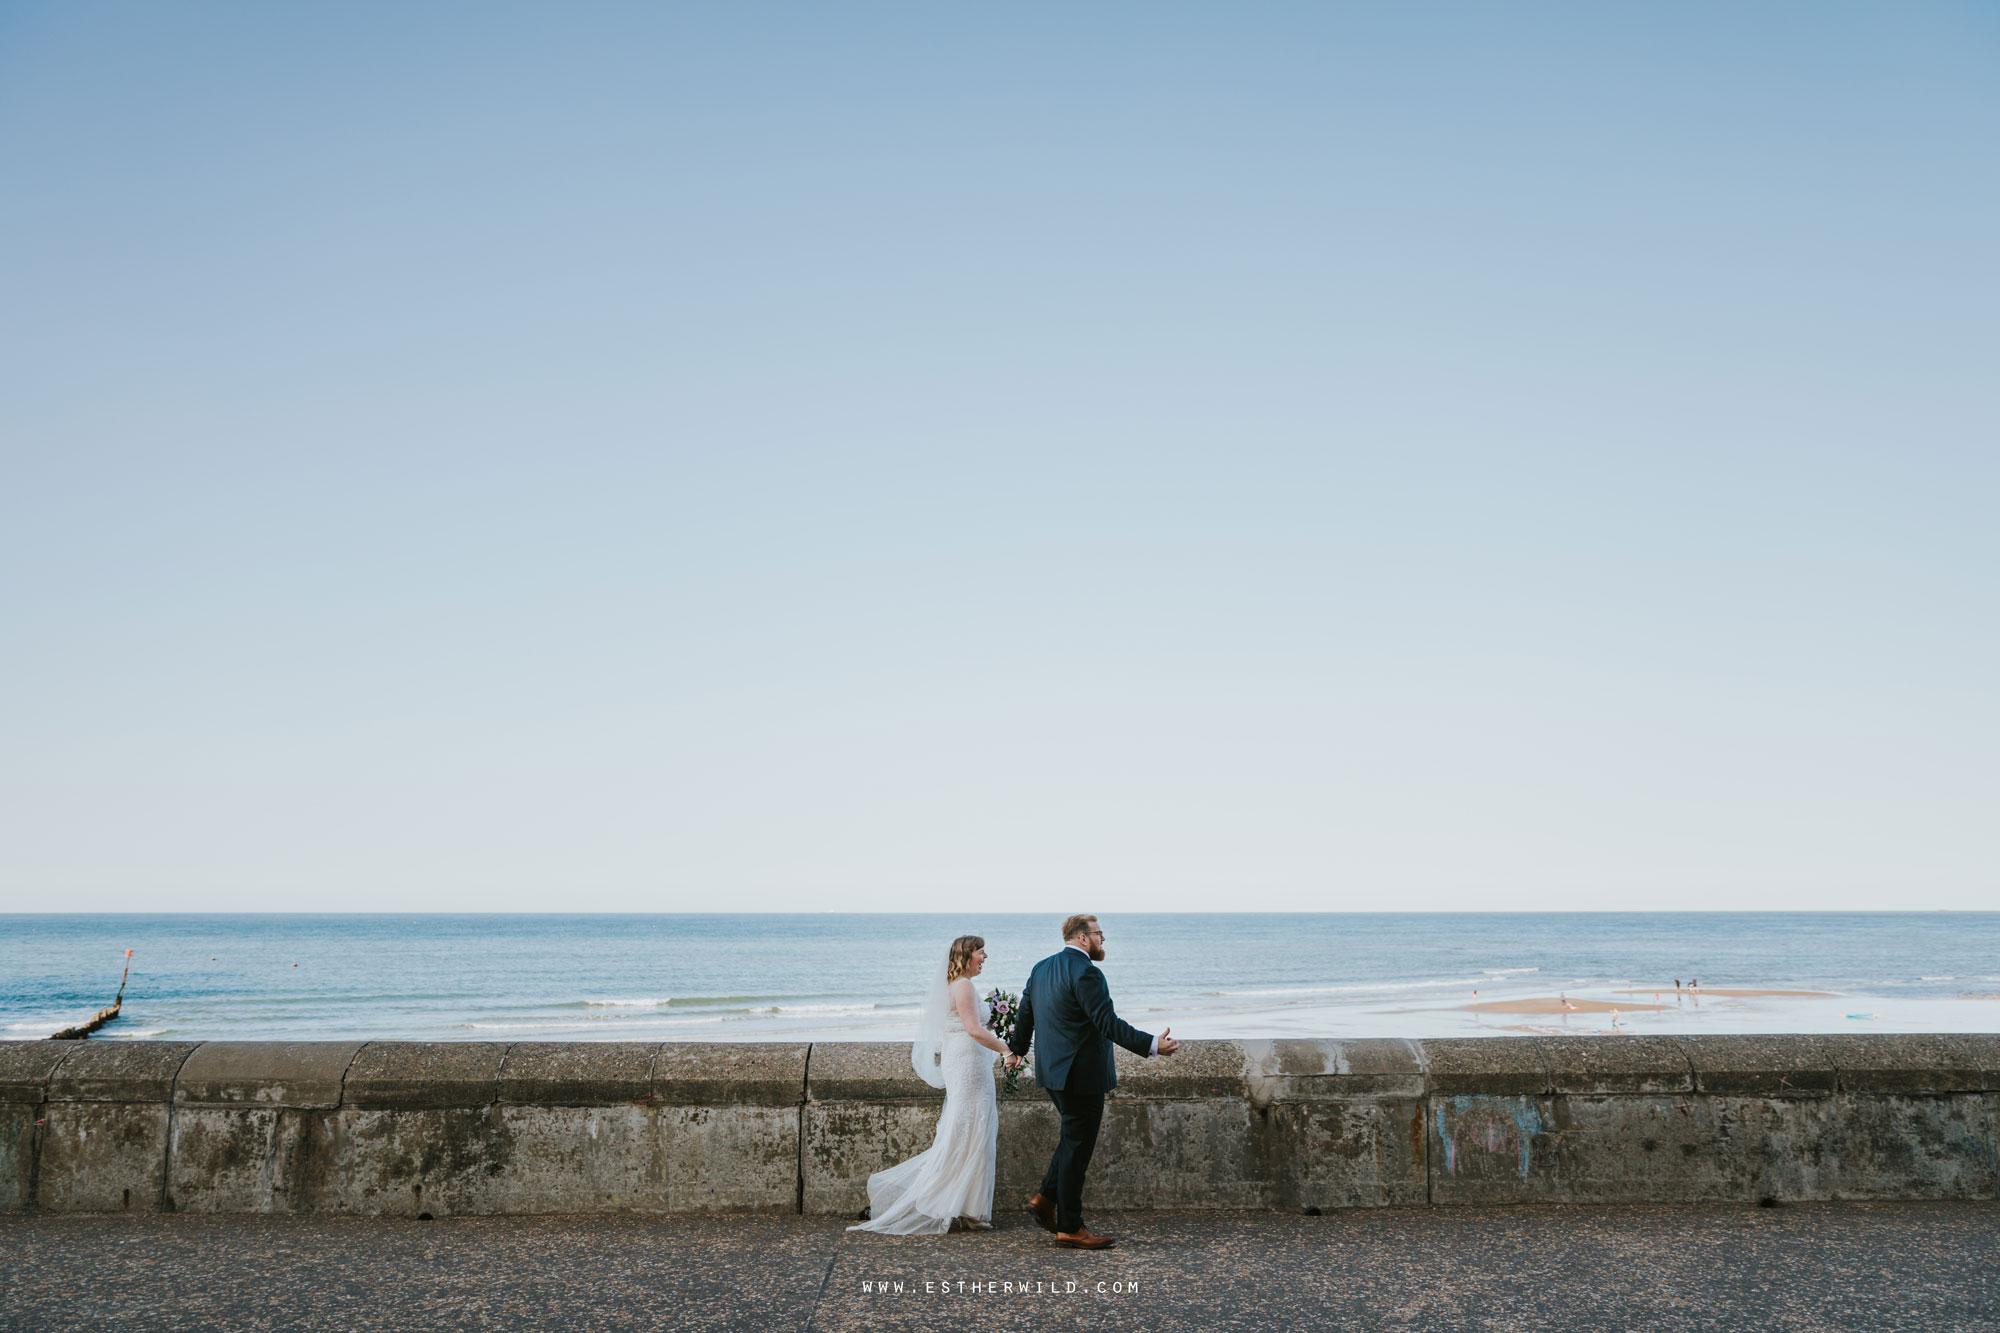 Cromer_Wedding_Beach_Outdoor_Ceremony_Norfolk_North_Lodge_Registry_Office_Rocket_House_Cafe_Cromer_Pier_IMG_4726.jpg